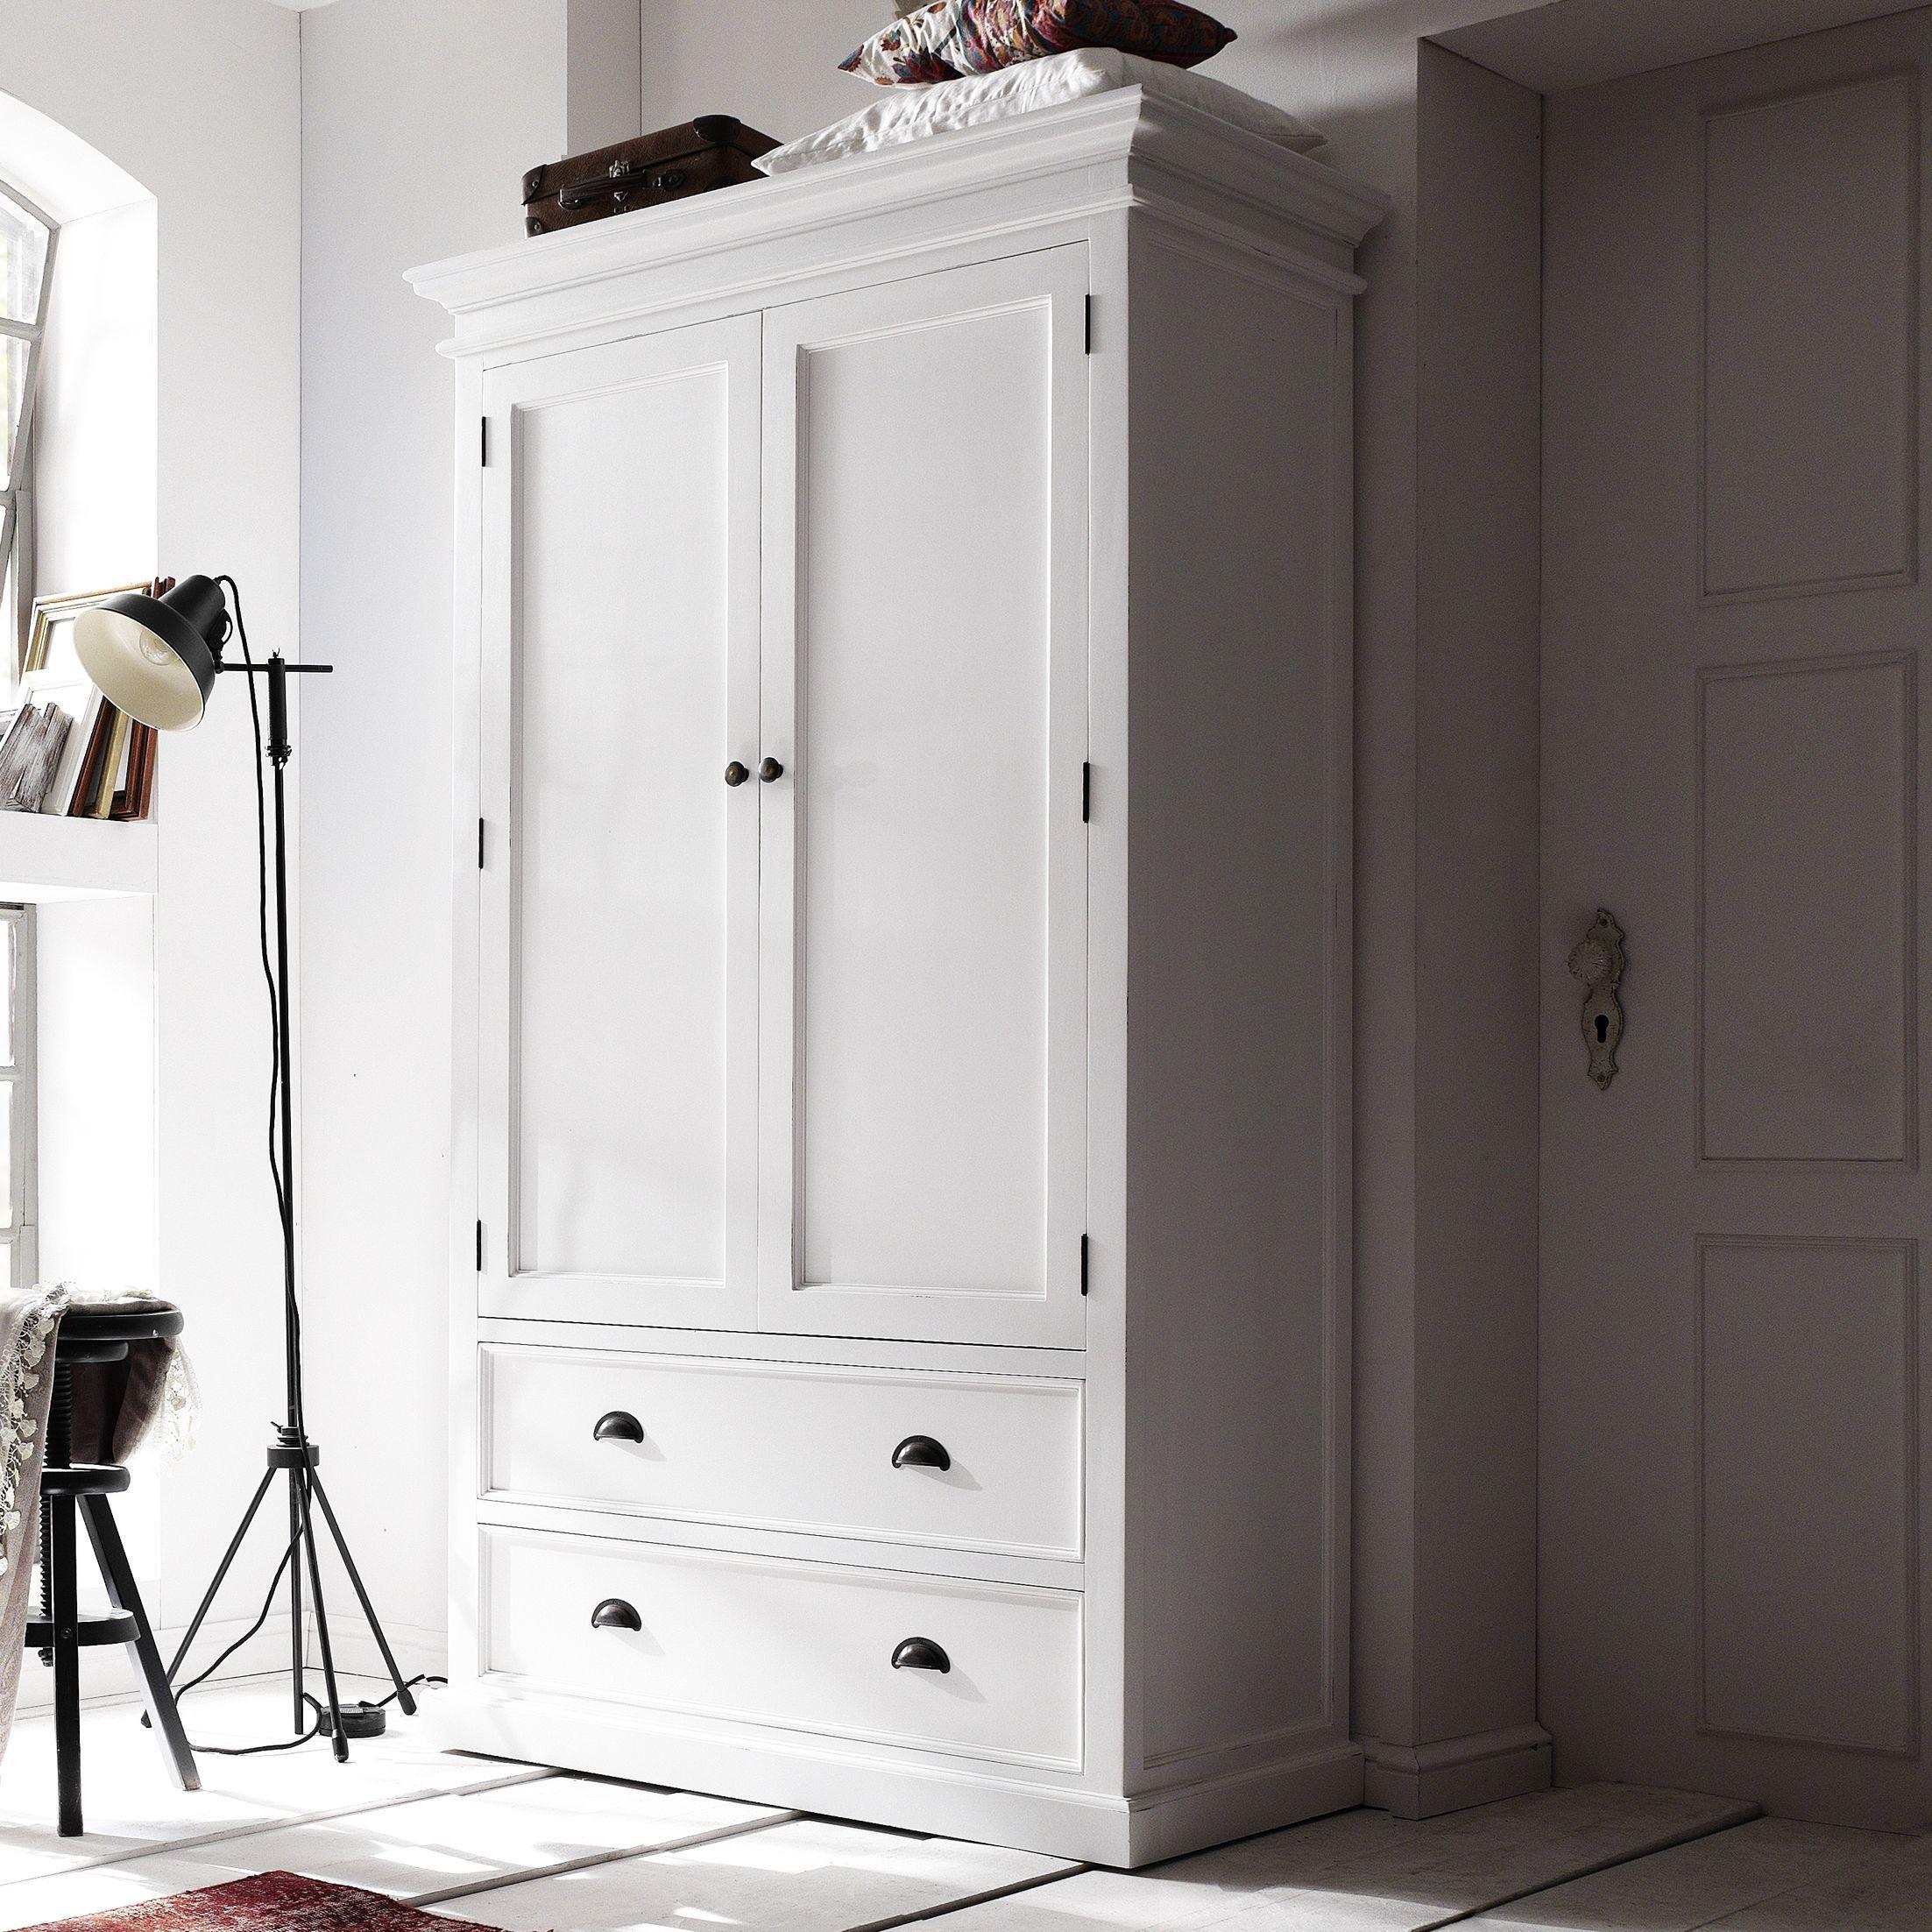 white wood wardrobe armoire shabby chic bedroom. Armoires \u0026 Wardrobes. Double WardrobeWhite Wooden White Wood Wardrobe Armoire Shabby Chic Bedroom